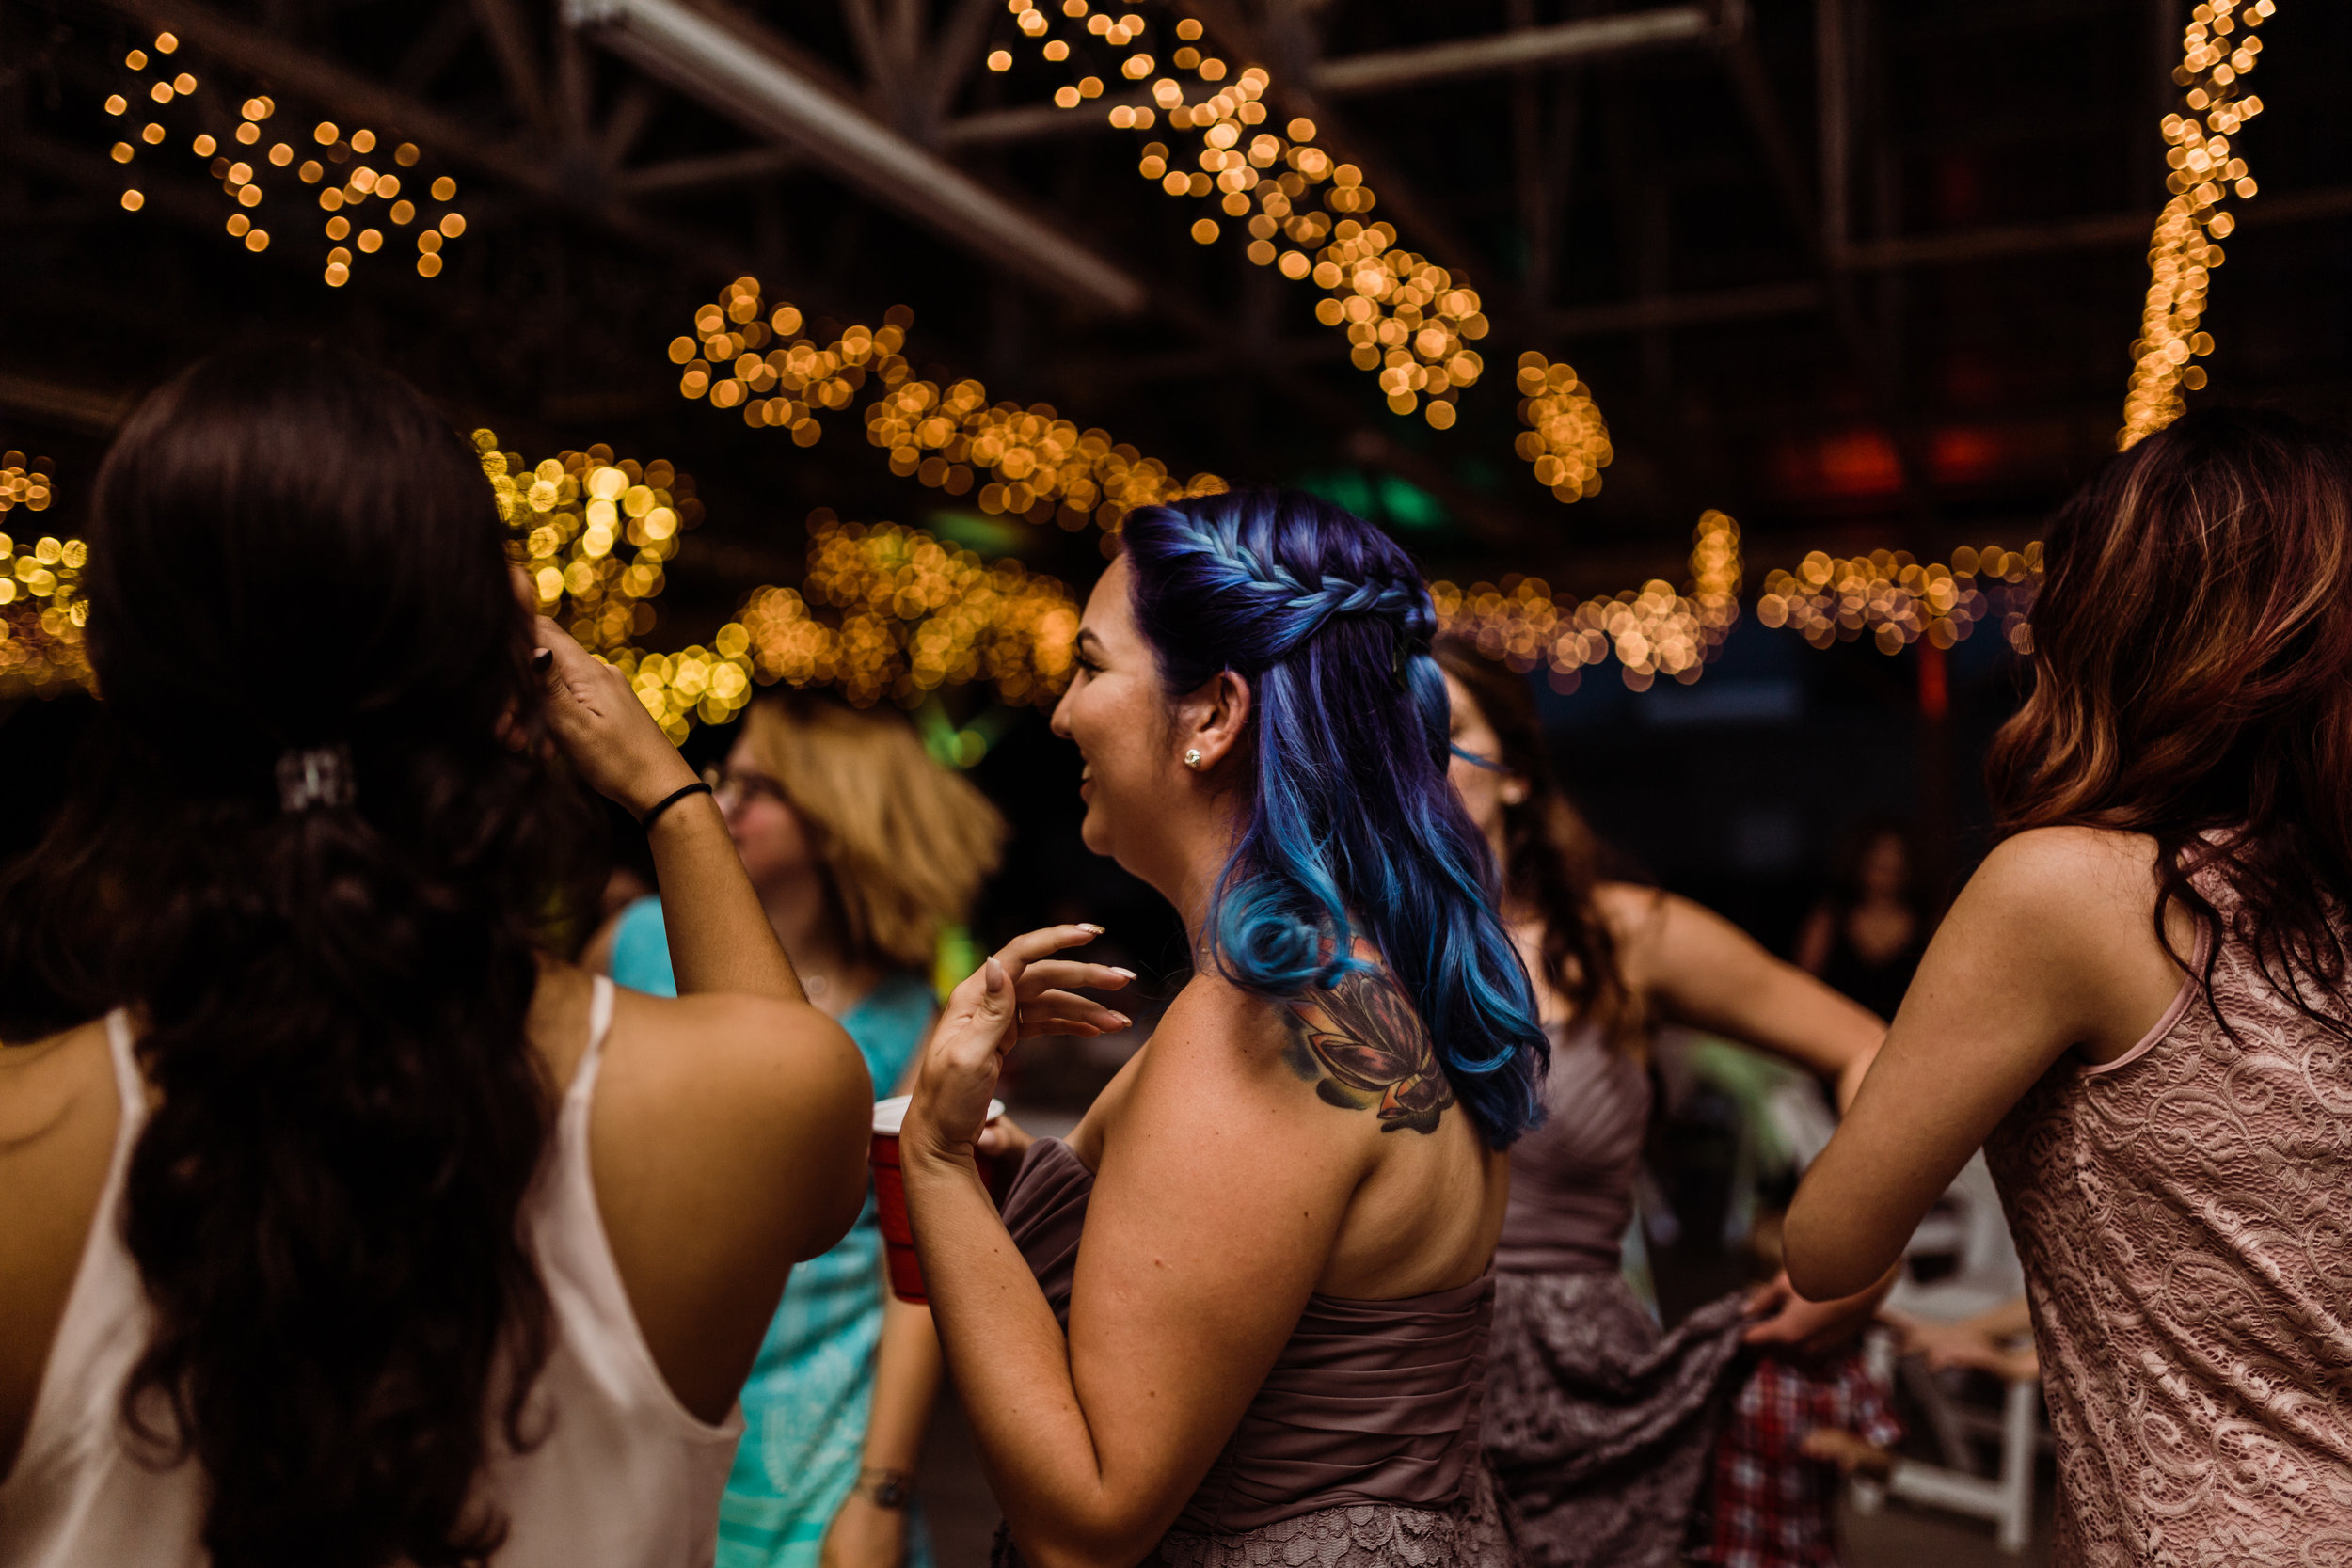 2017.10.14 Samantha and Matthew Crabtree Sarasota Wedding (581 of 708).jpg